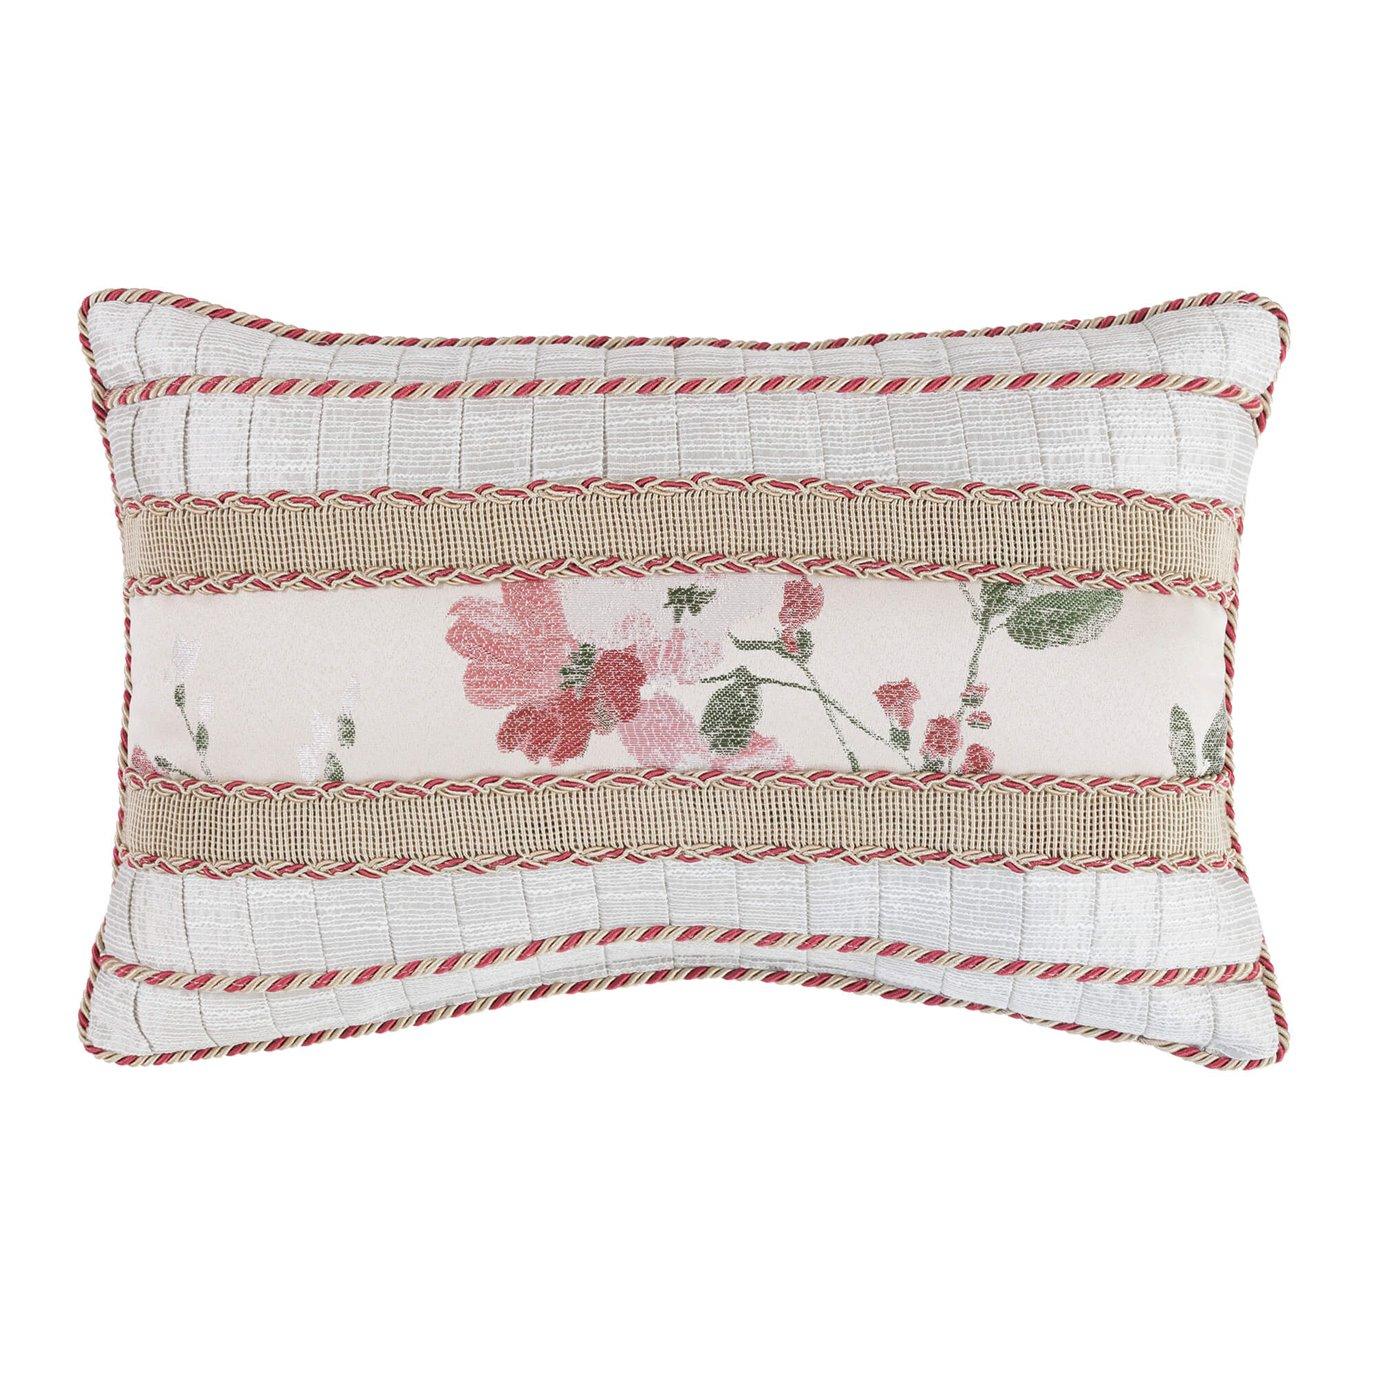 Croscill Blyth Boudoir Pillow